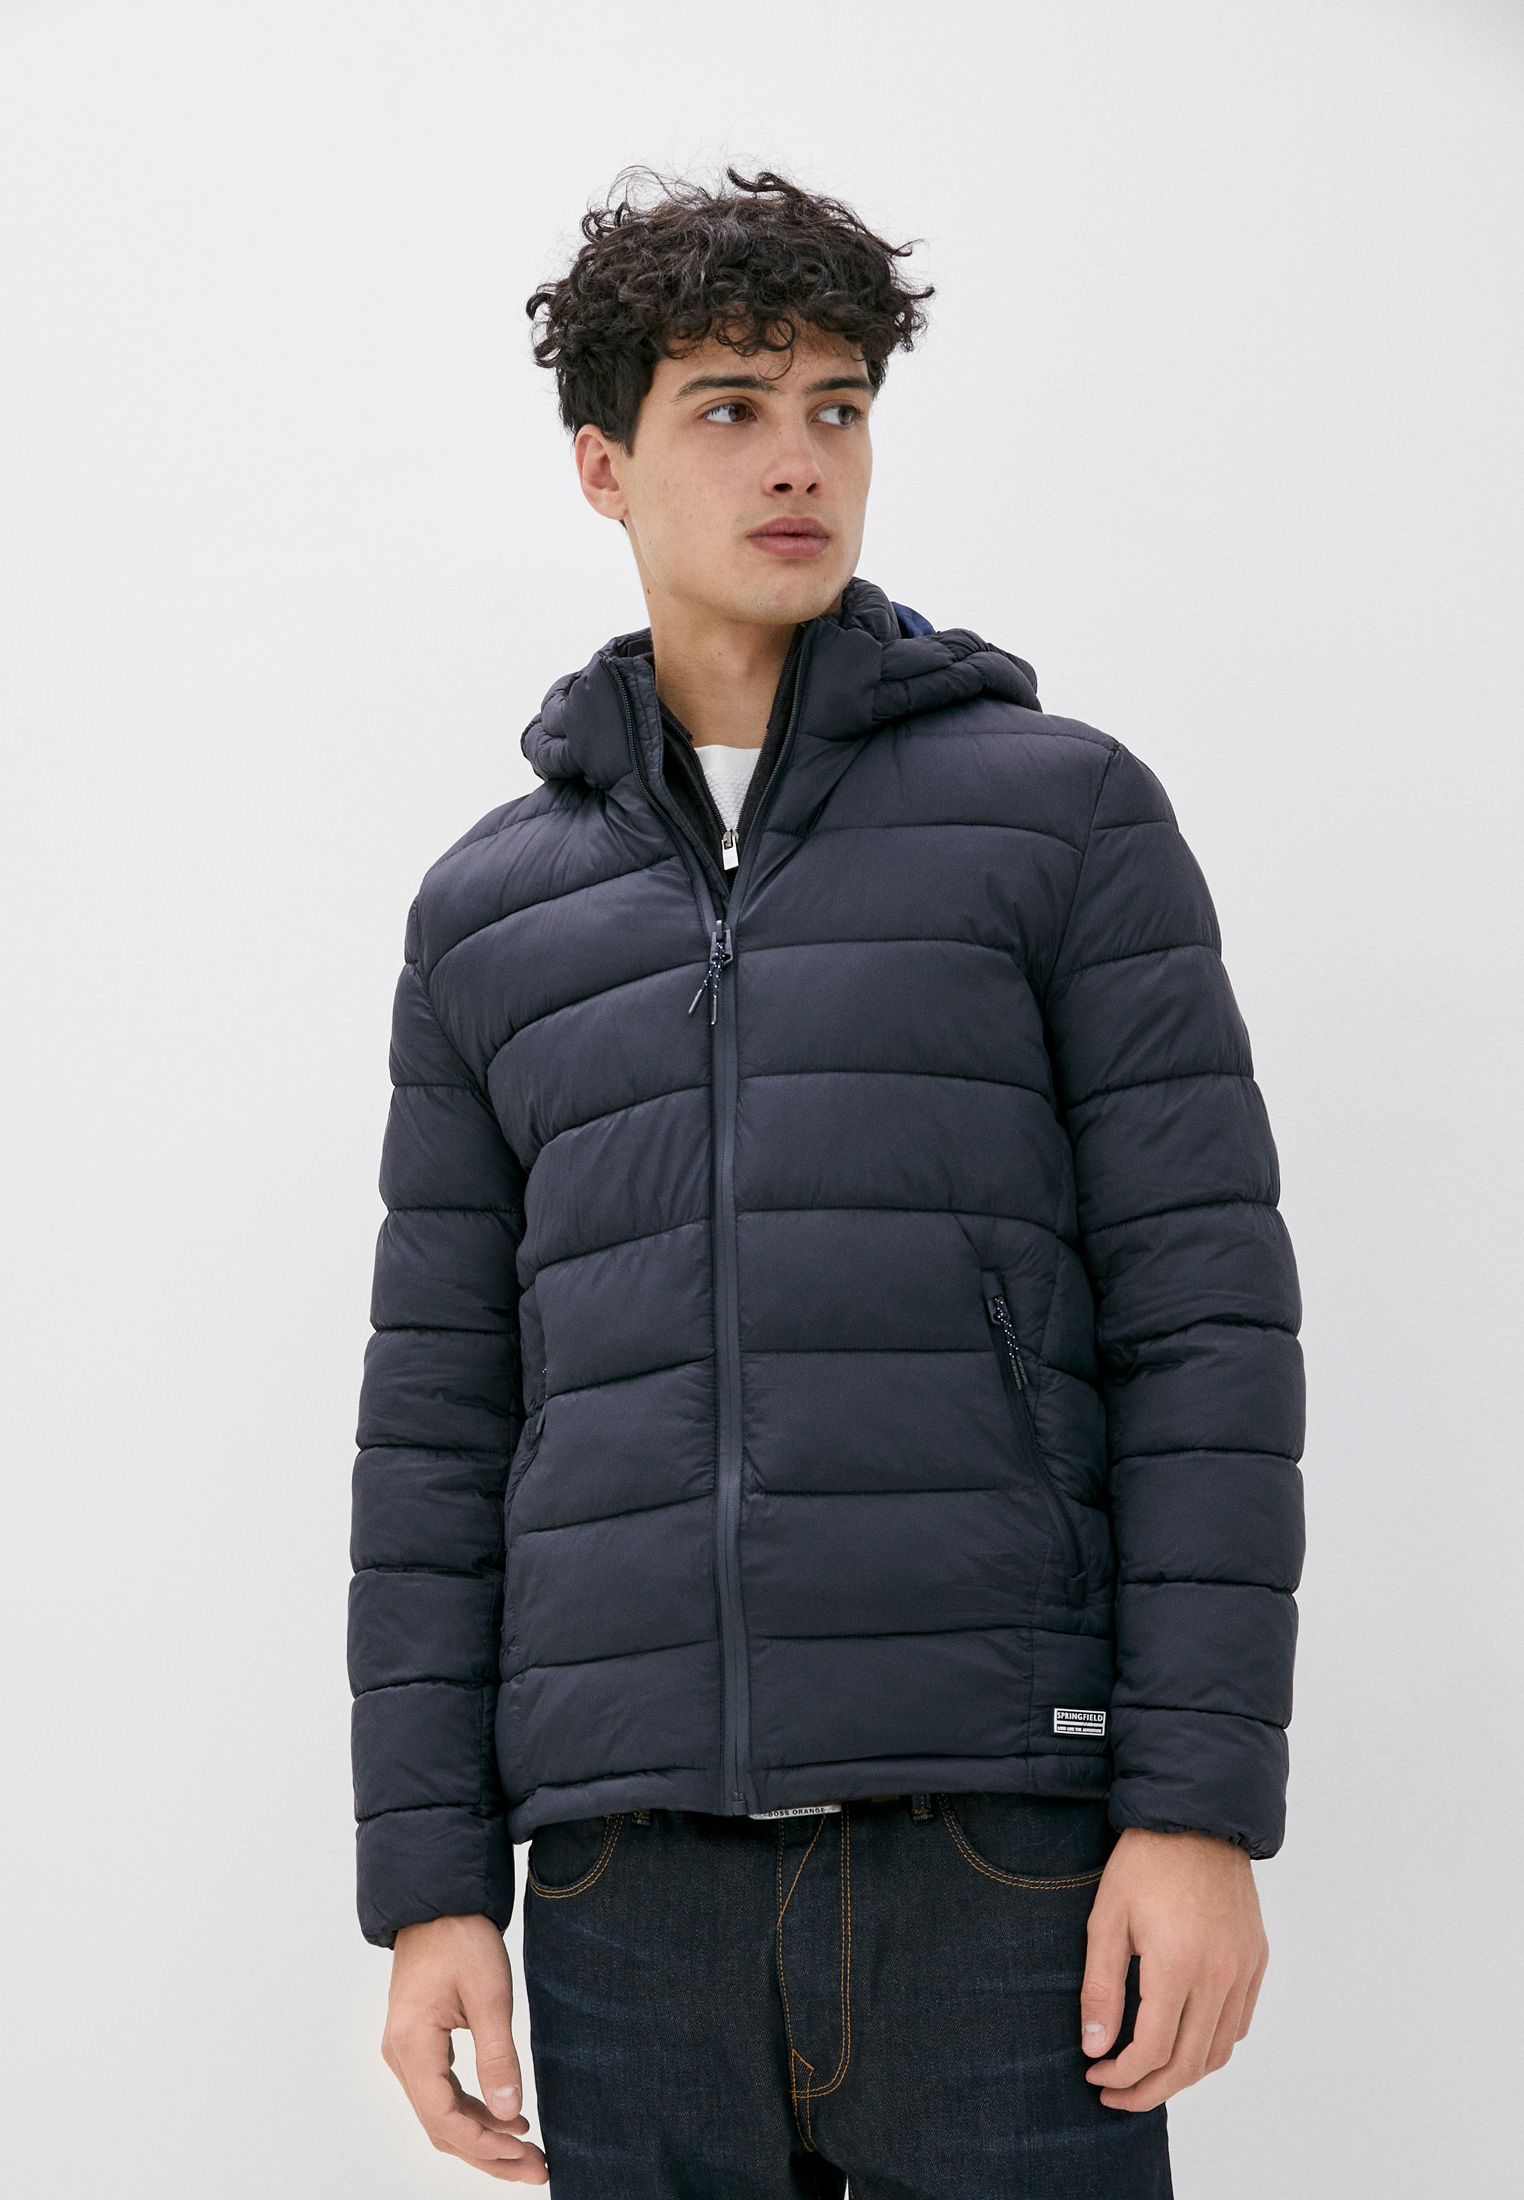 Утепленная куртка SPRINGFIELD Куртка утепленная Springfield